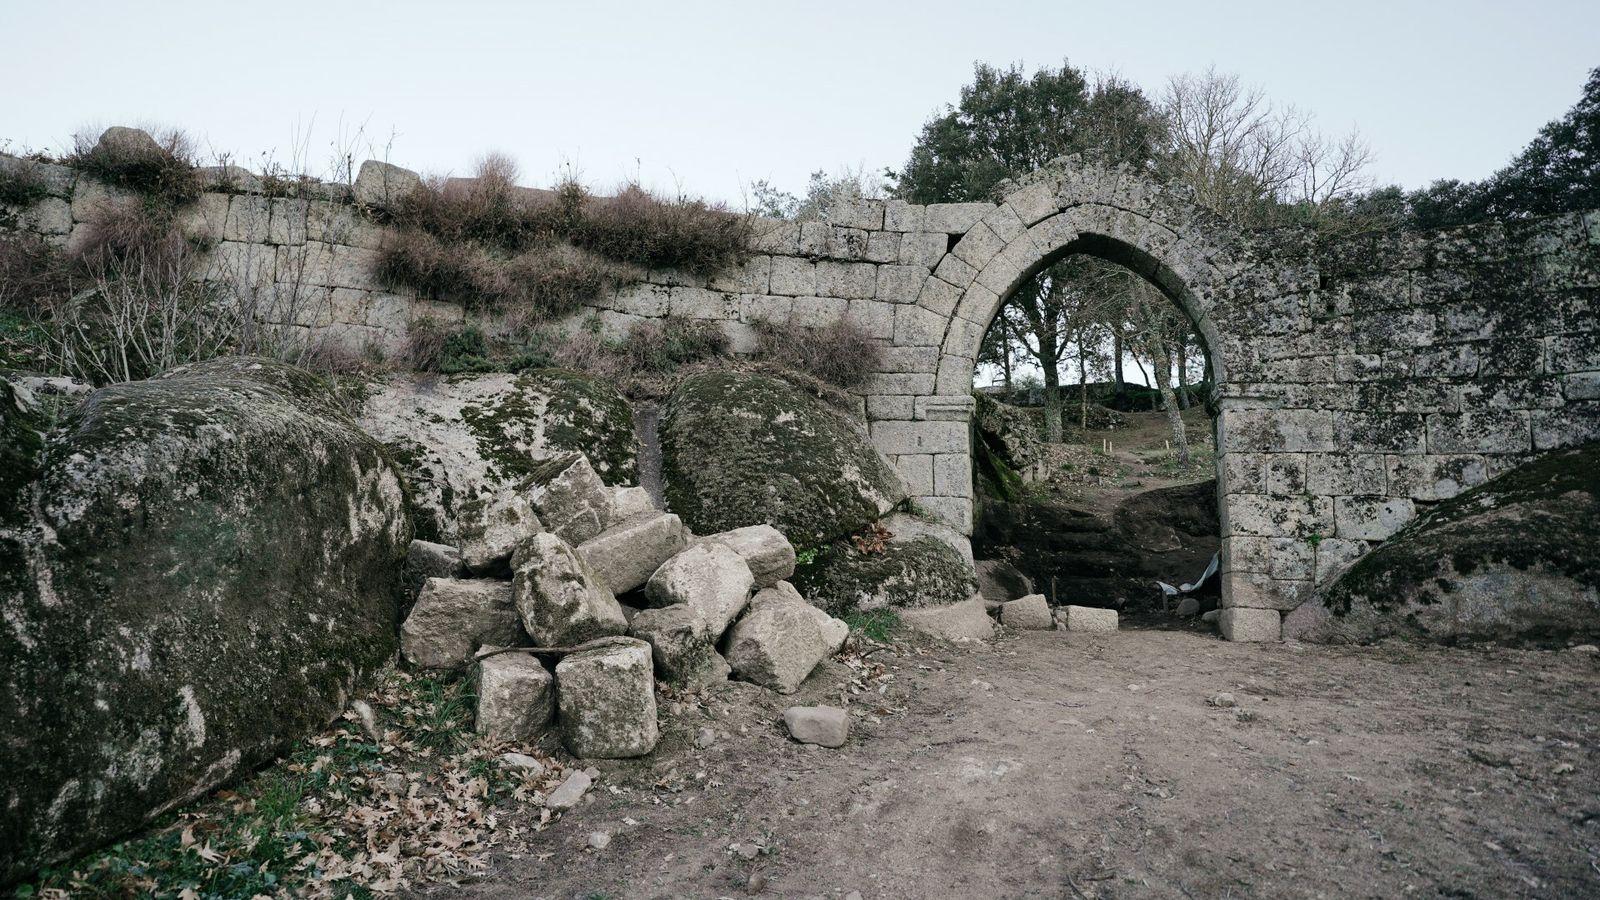 Arco gótico do Castelo de Vila do Touro